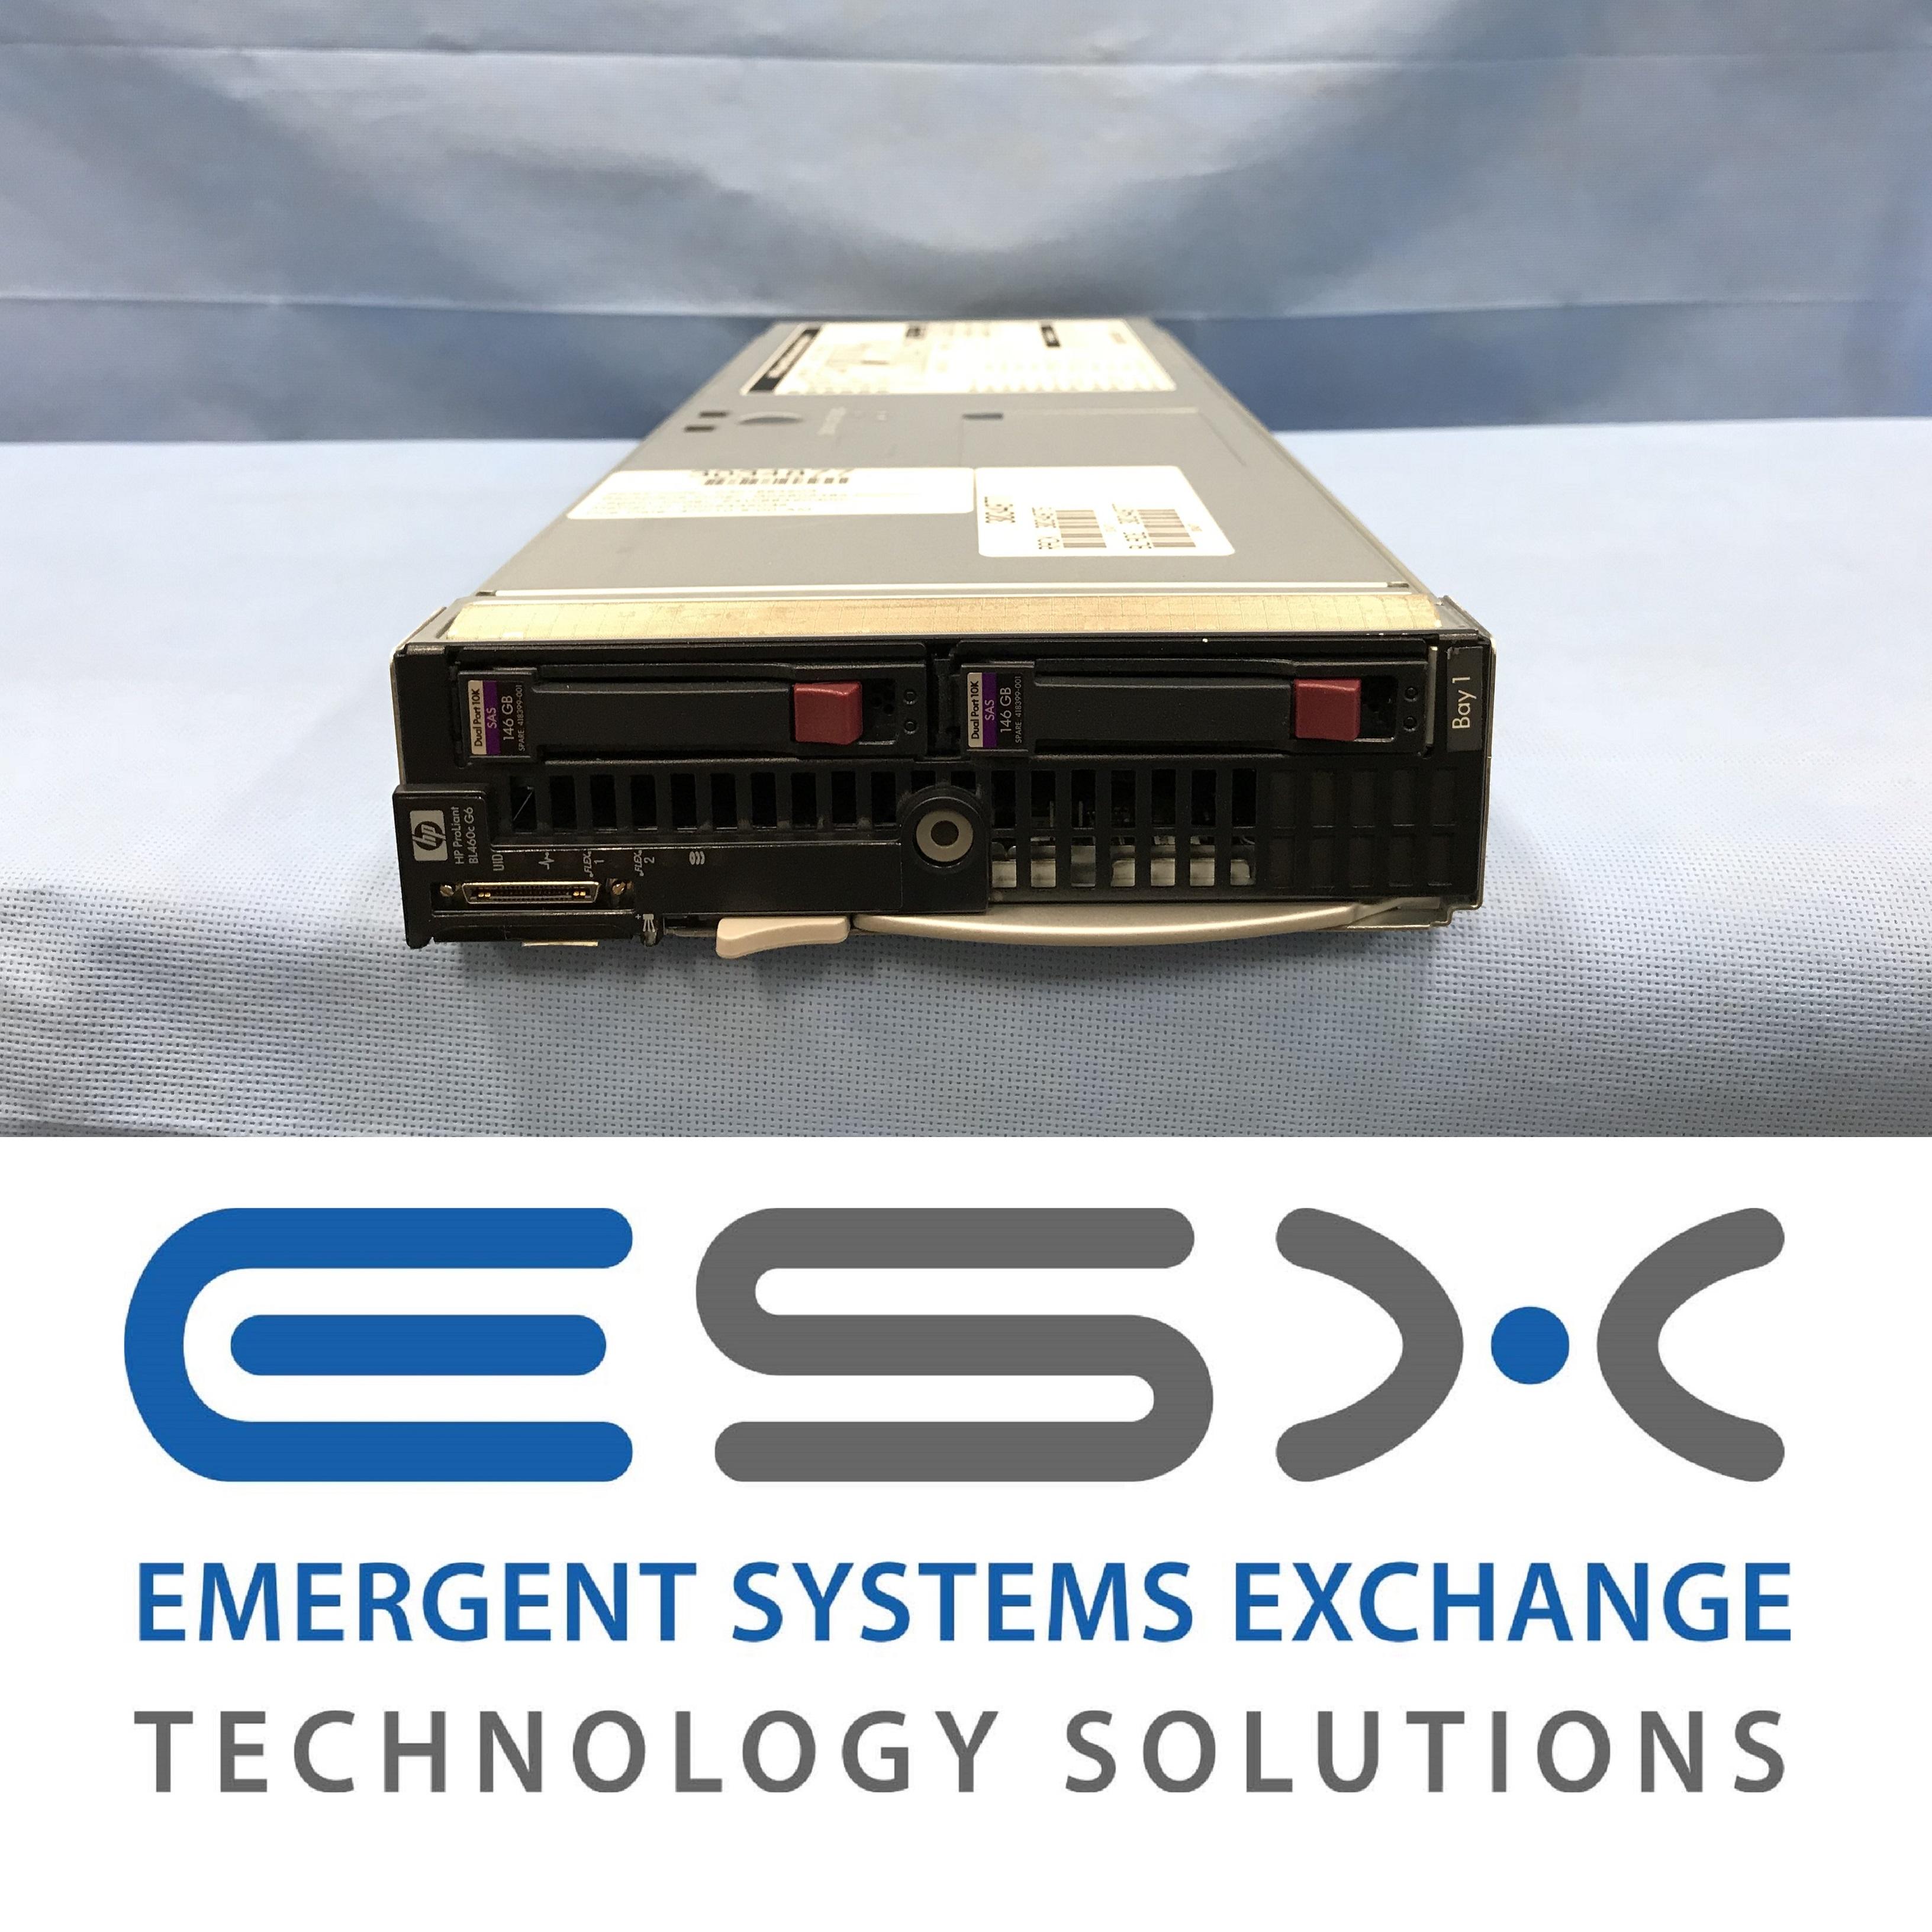 HP Proliant DL360 G6 SERVER 2x 6 CORE L5640 2.26GHz 8GB RAM 2x 146GB 10K SAS